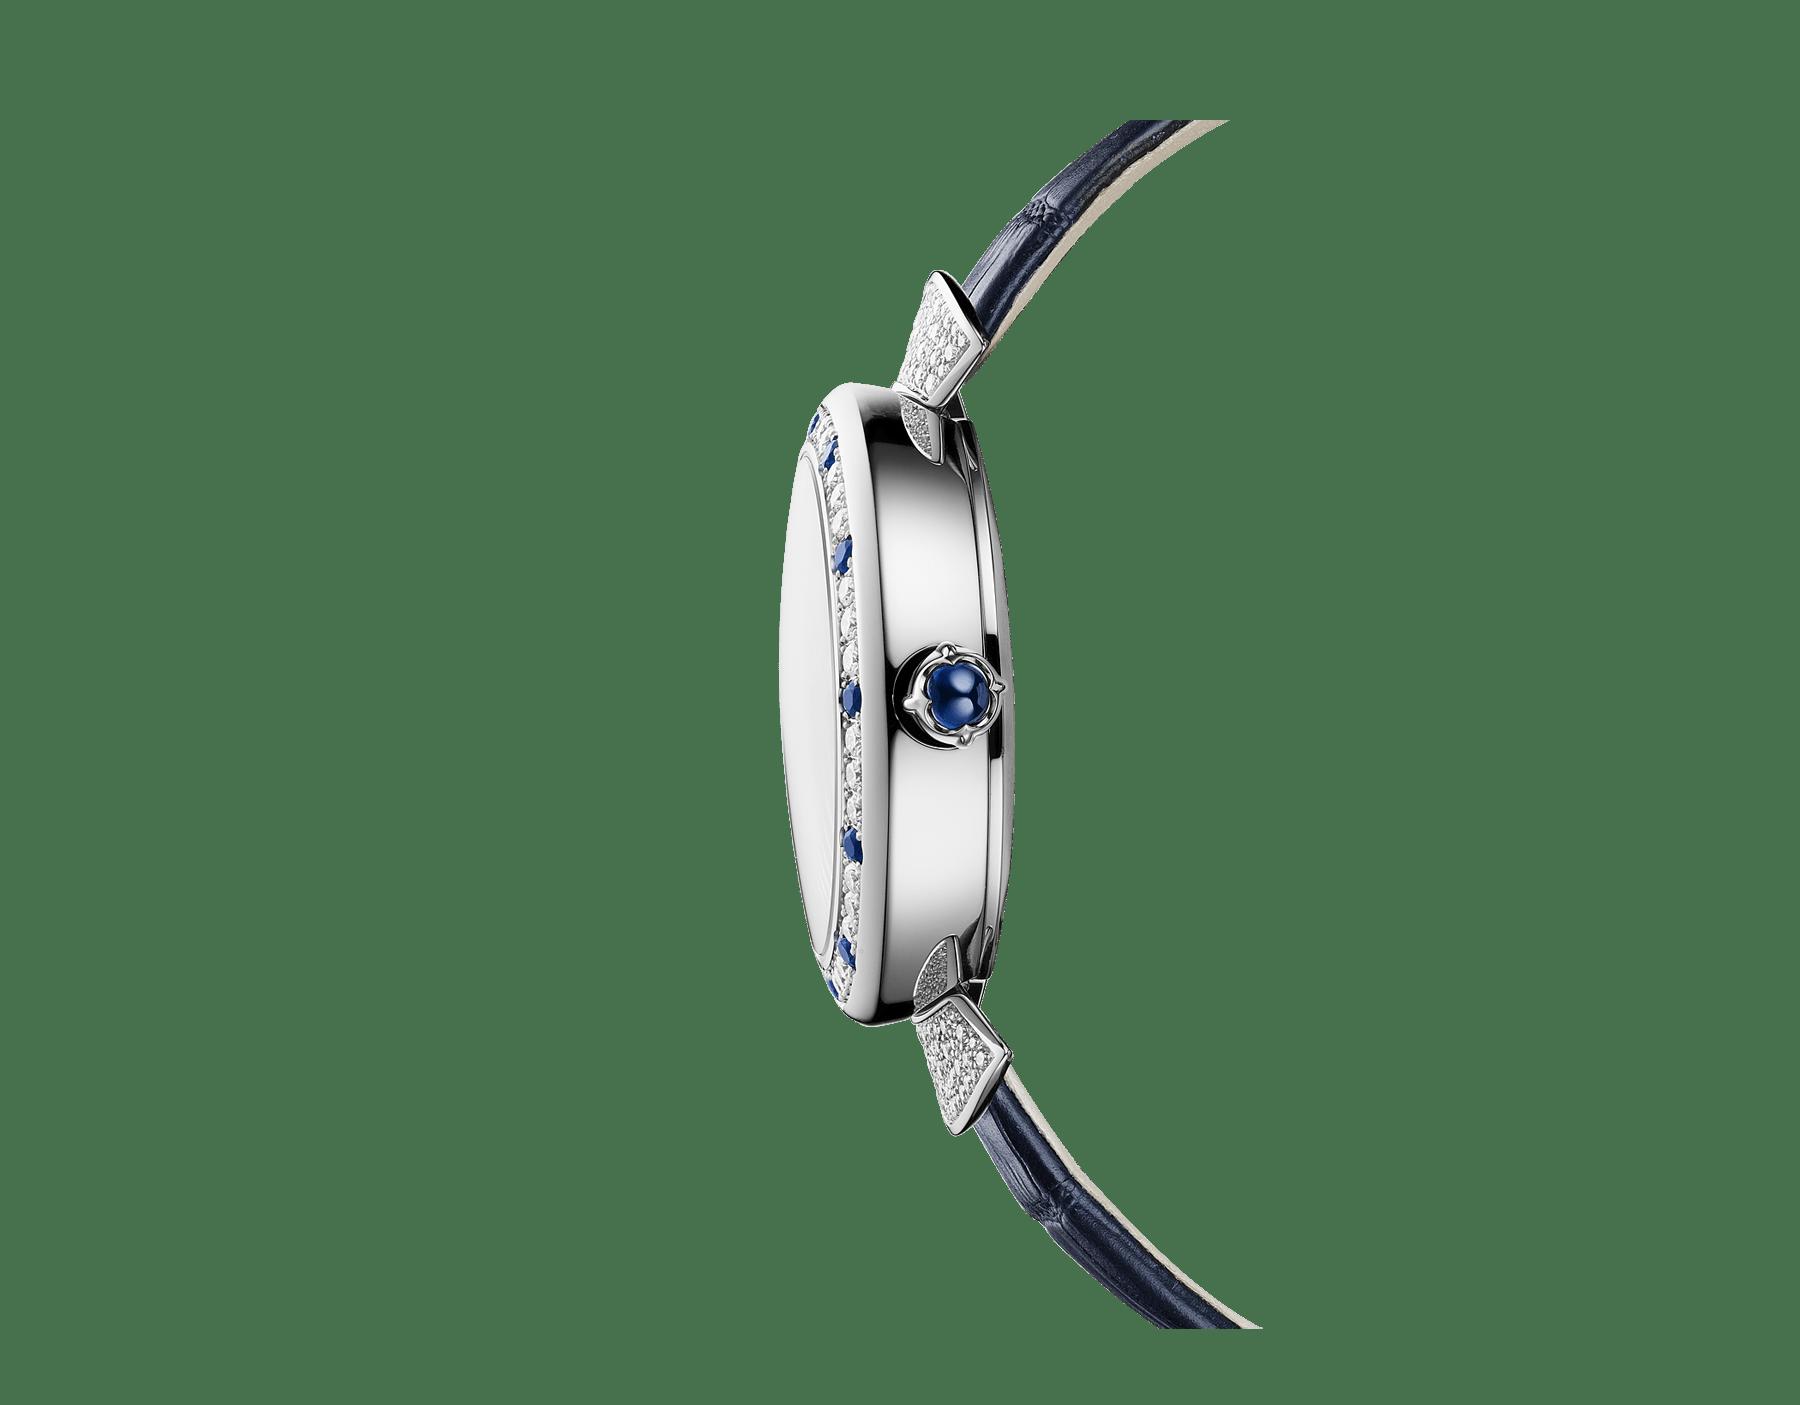 DIVAS' DREAM腕表,搭载品牌自制的自动上链机械机芯,18K白金表壳,镶嵌圆形明亮式切割钻石和蓝宝石,砂金石旋转表盘镶嵌钻石,并饰以星座图案,深蓝色鳄鱼皮表带 102842 image 2